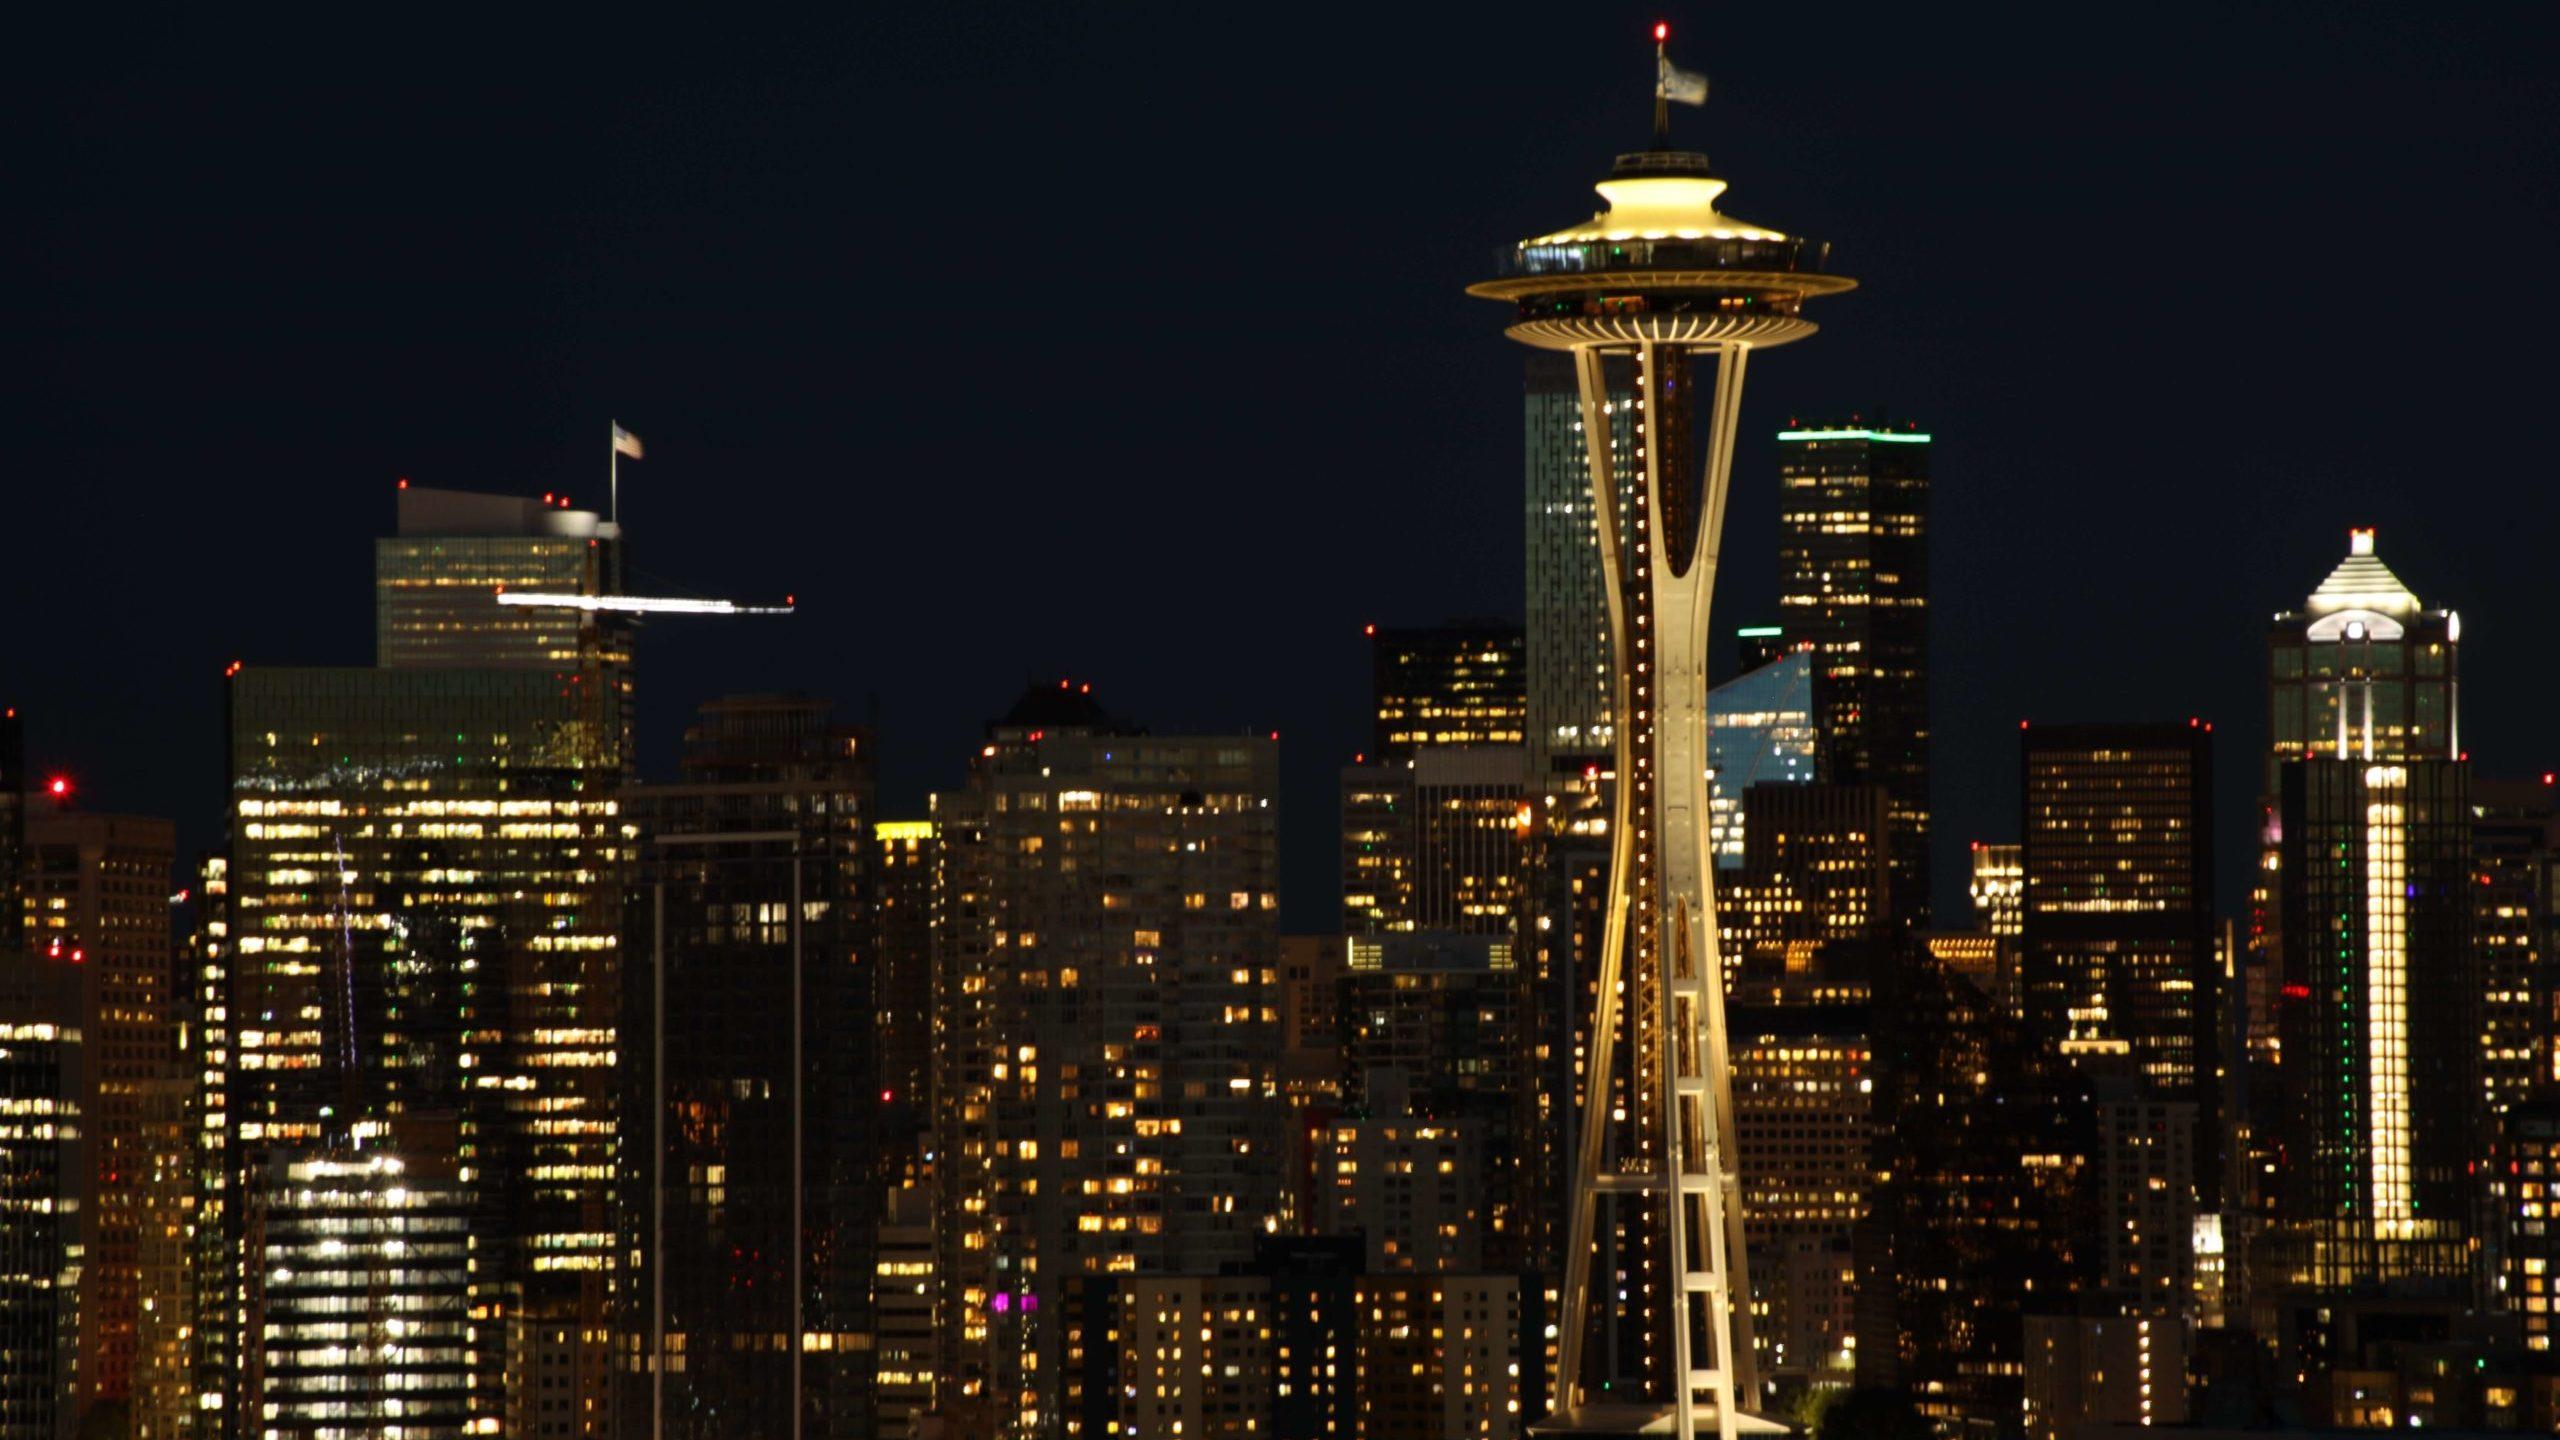 Lorena Gonzalez Favored For Next Seattle Mayor Betting